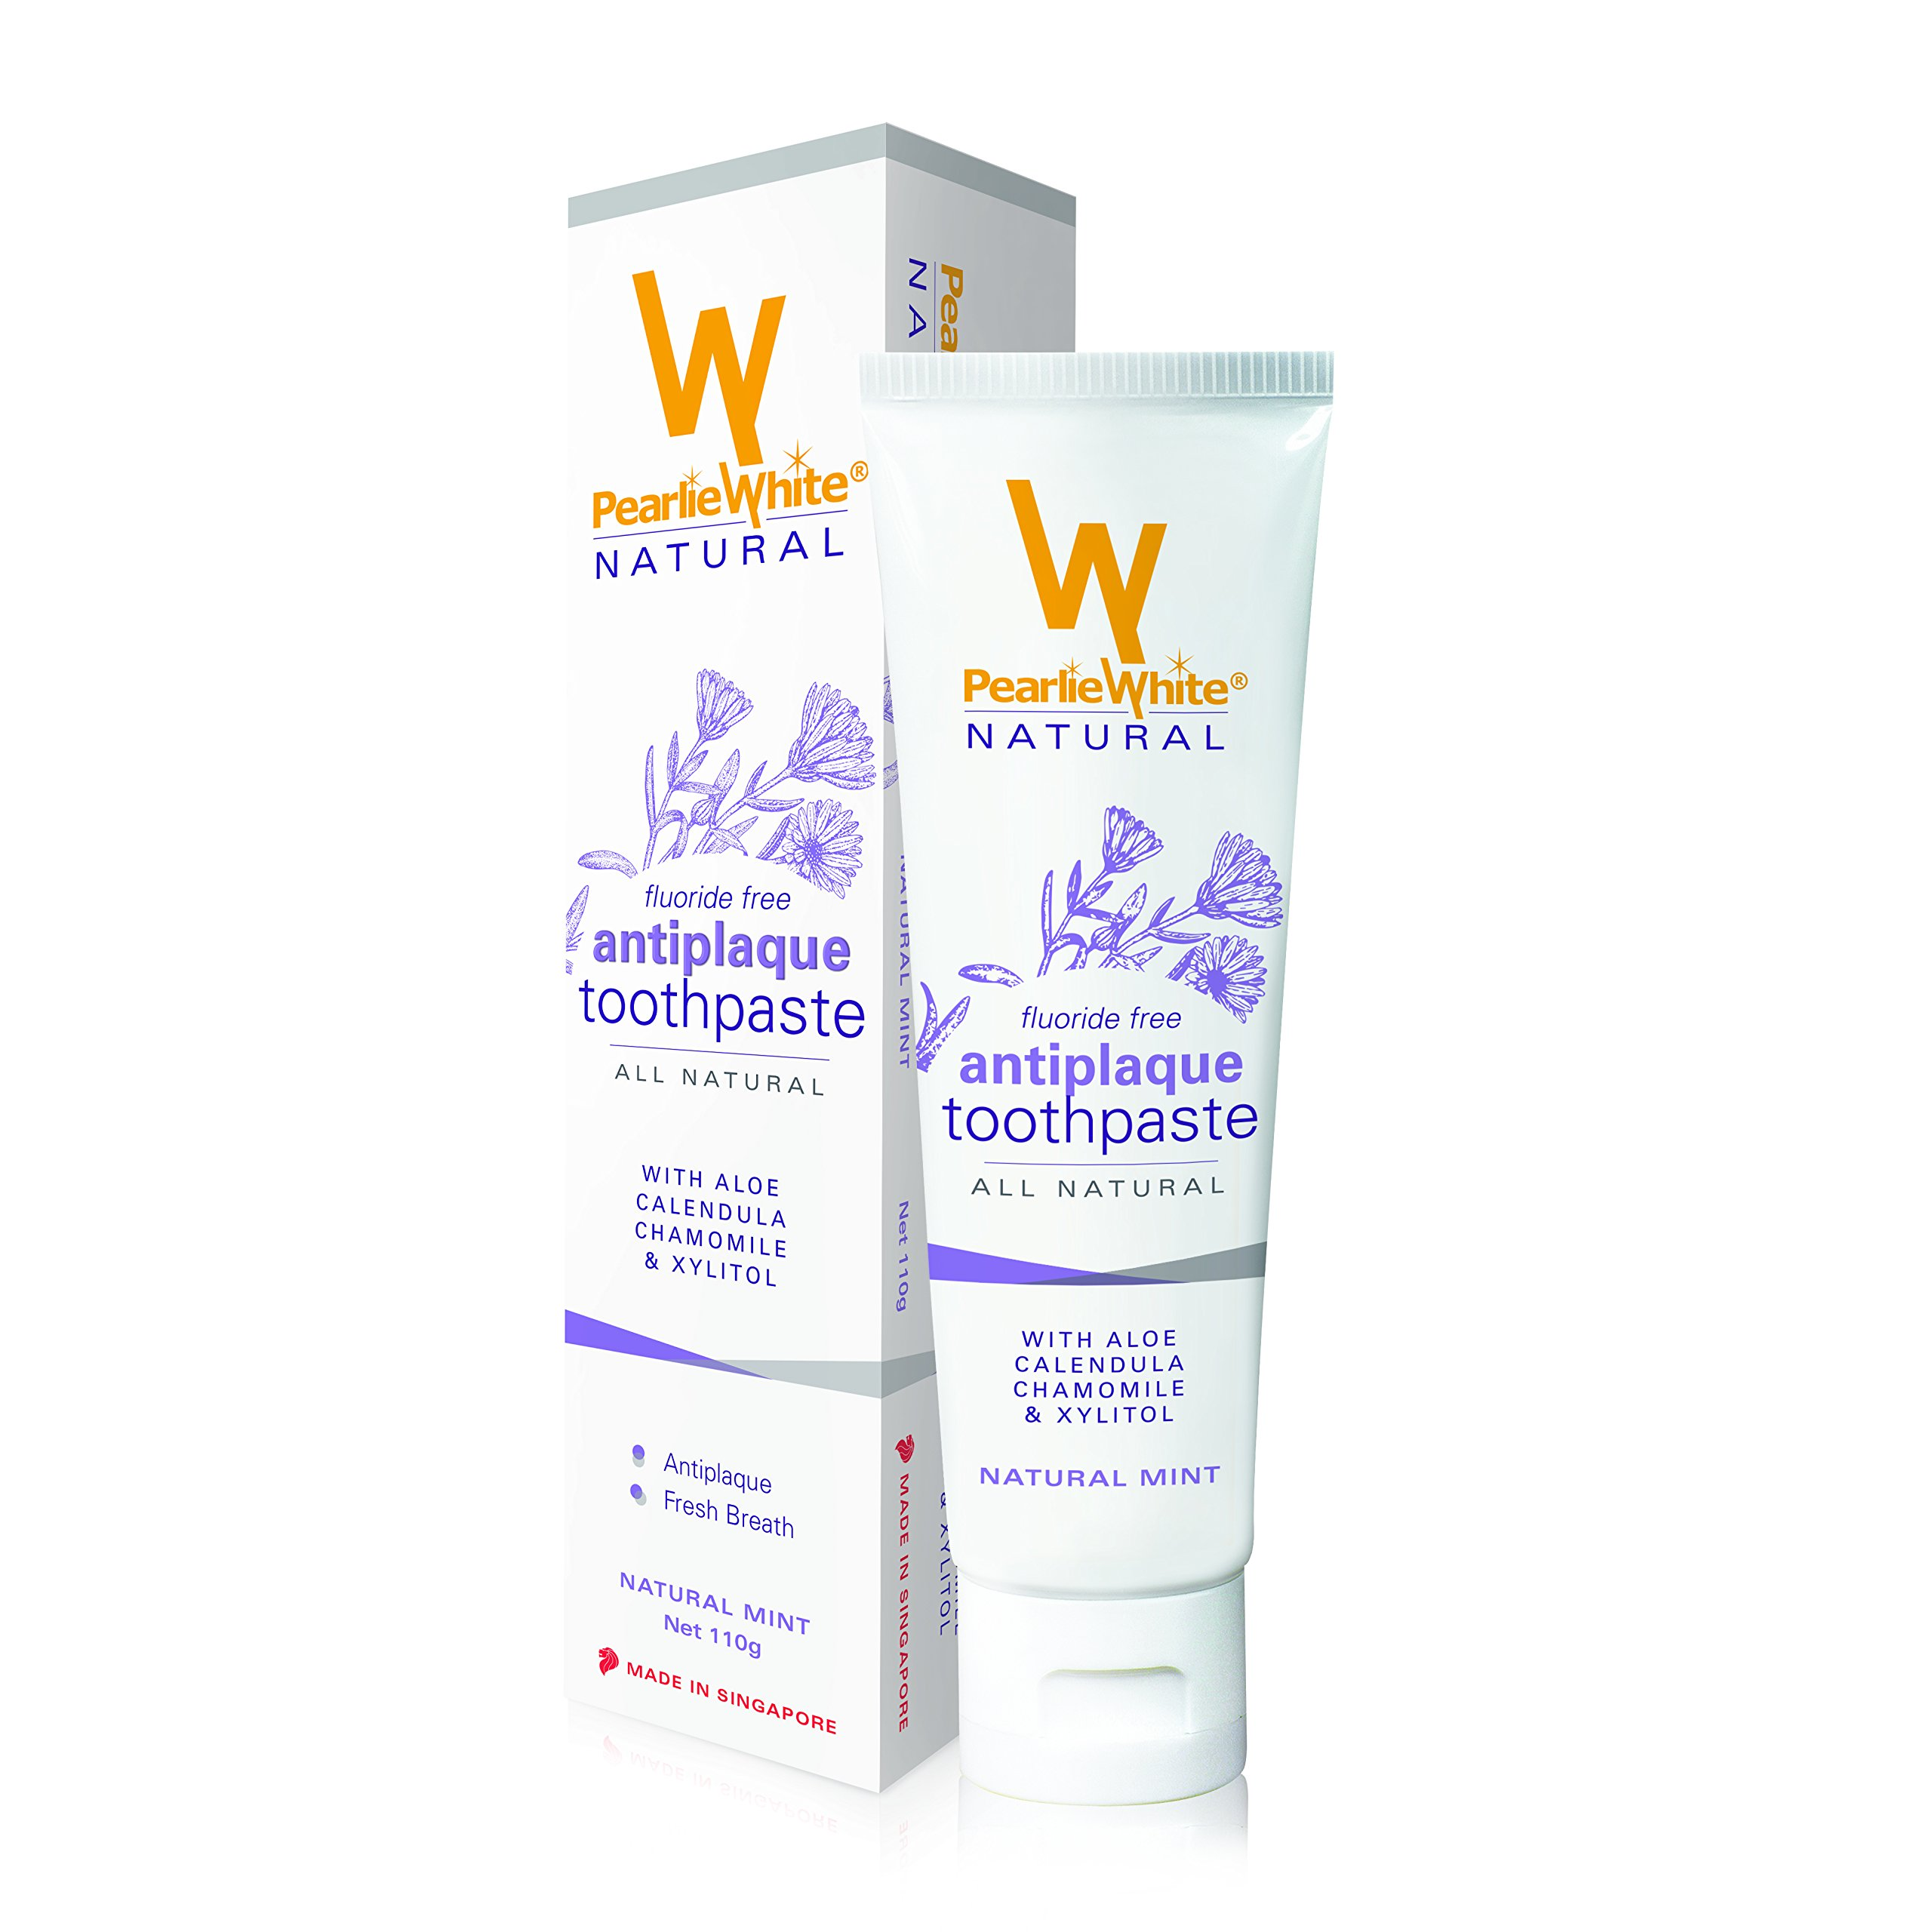 Pearlie White Natural Antiplaque Fluoride Free Toothpaste (3.8oz, 110gm) | Non Fluoride All Natural Toothpaste - NO SLS, Parabens, Triclosan, Titanium Dioxide